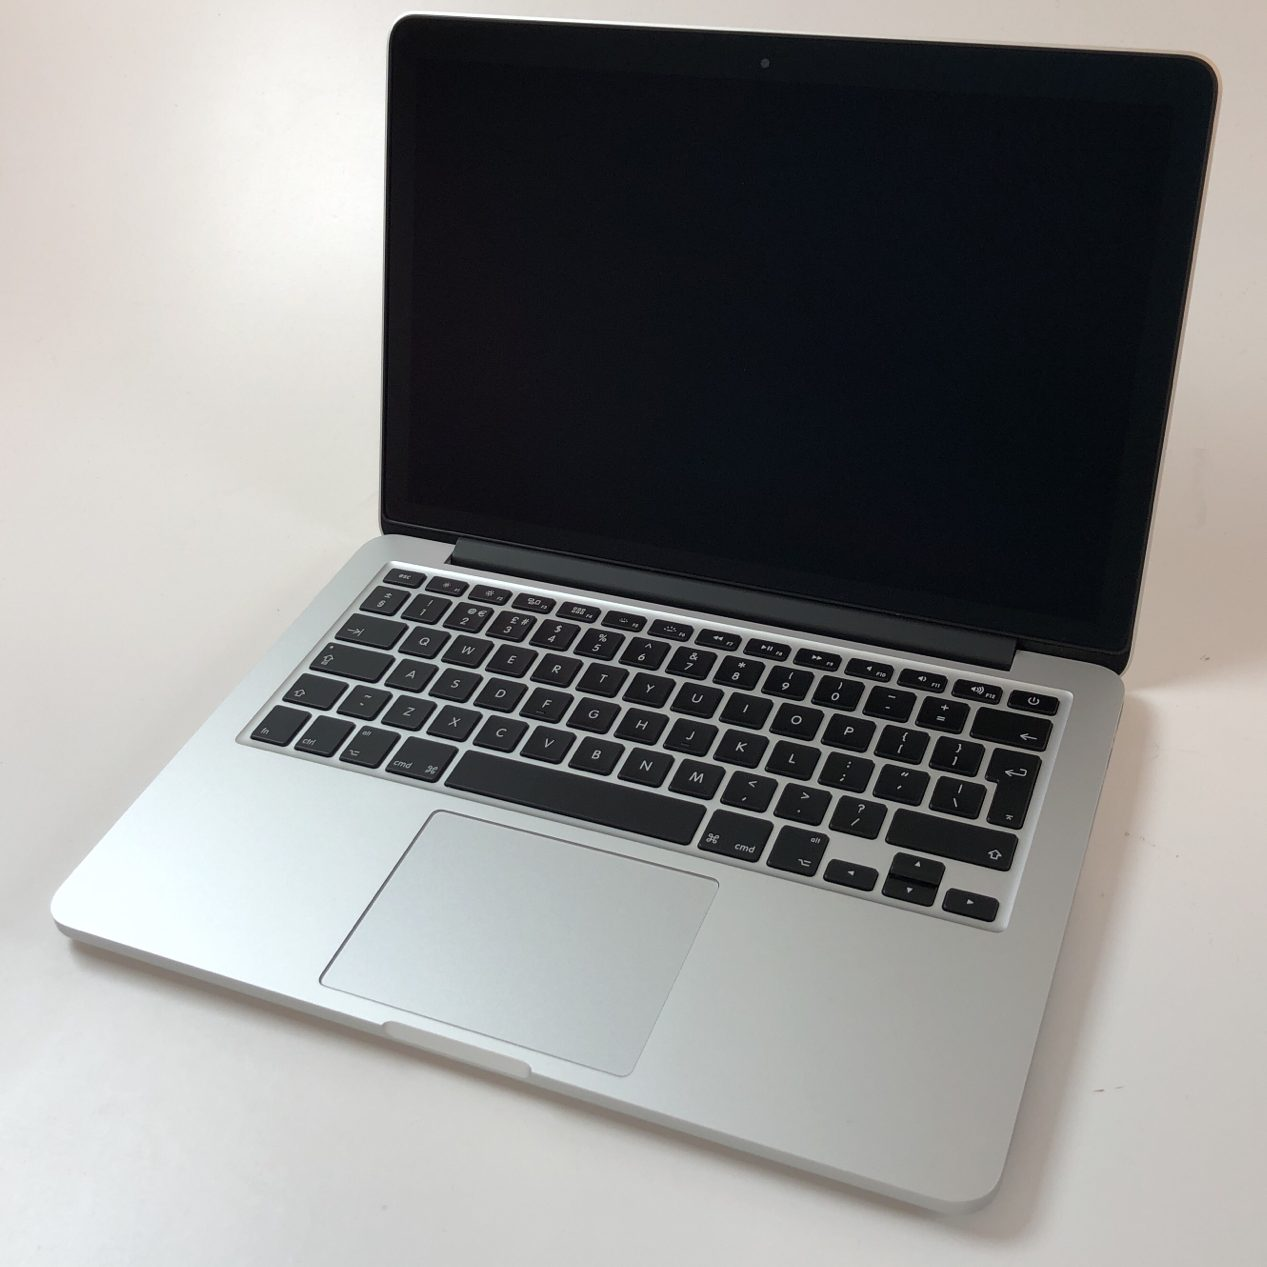 "MacBook Pro Retina 13"" Early 2015 (Intel Core i5 2.9 GHz 16 GB RAM 1 TB SSD), Intel Core i5 2.9 GHz, 16 GB RAM, 1 TB SSD, image 1"